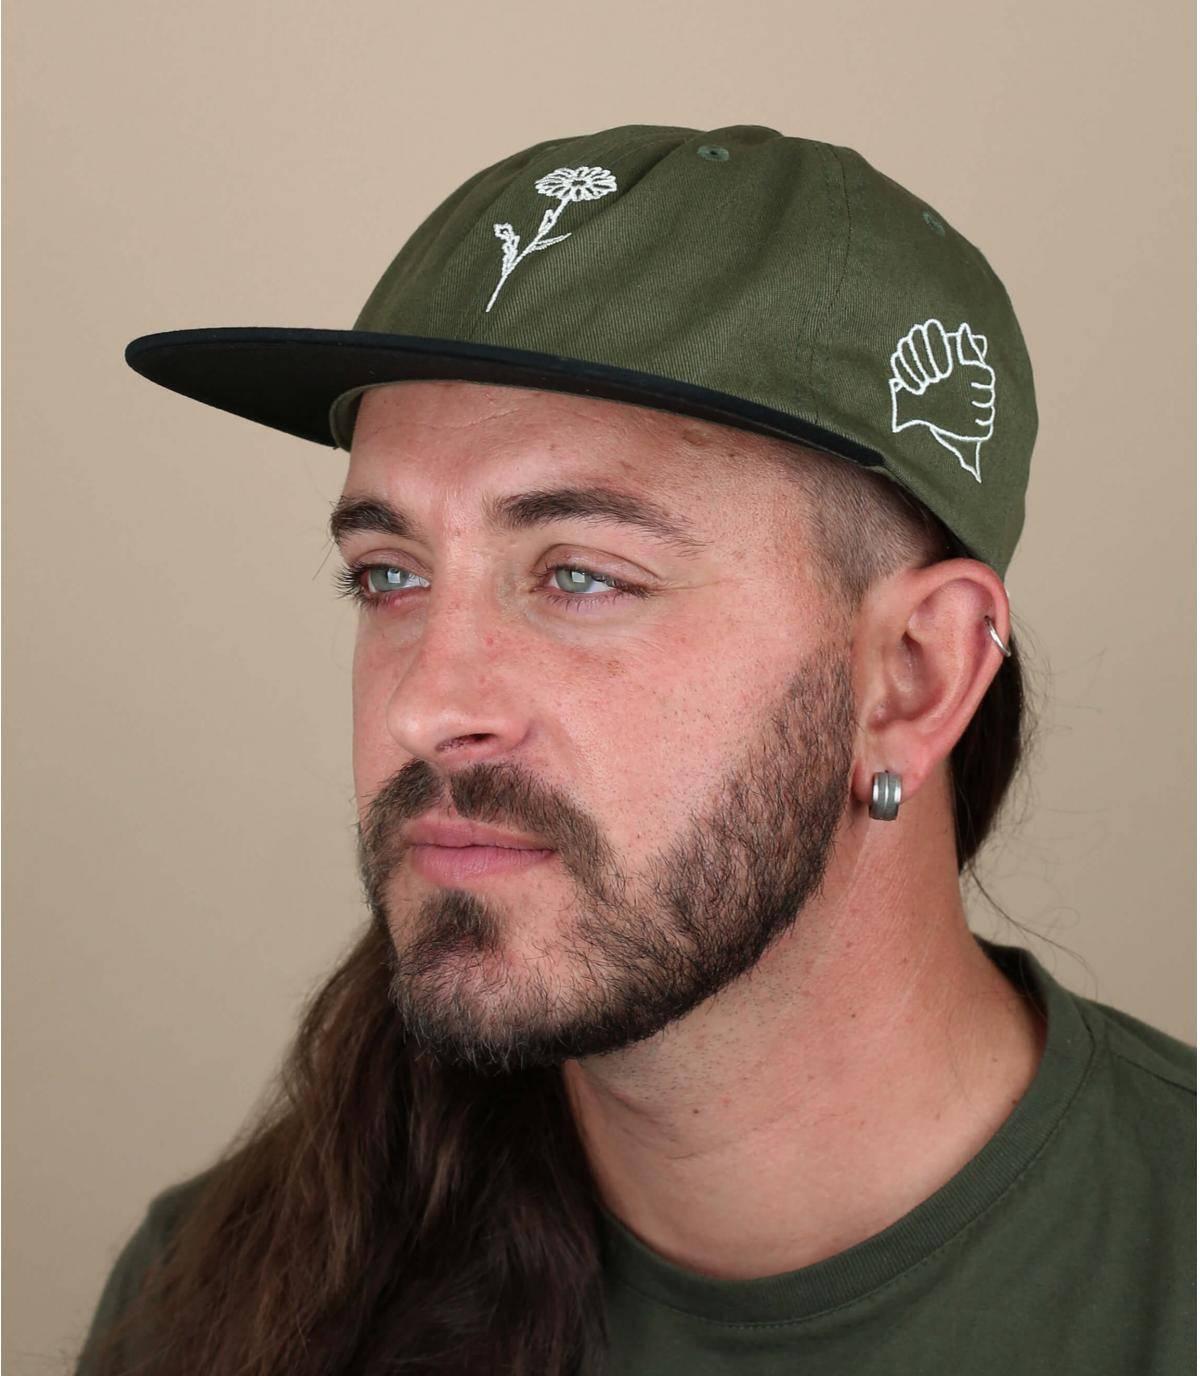 groene Obey cap